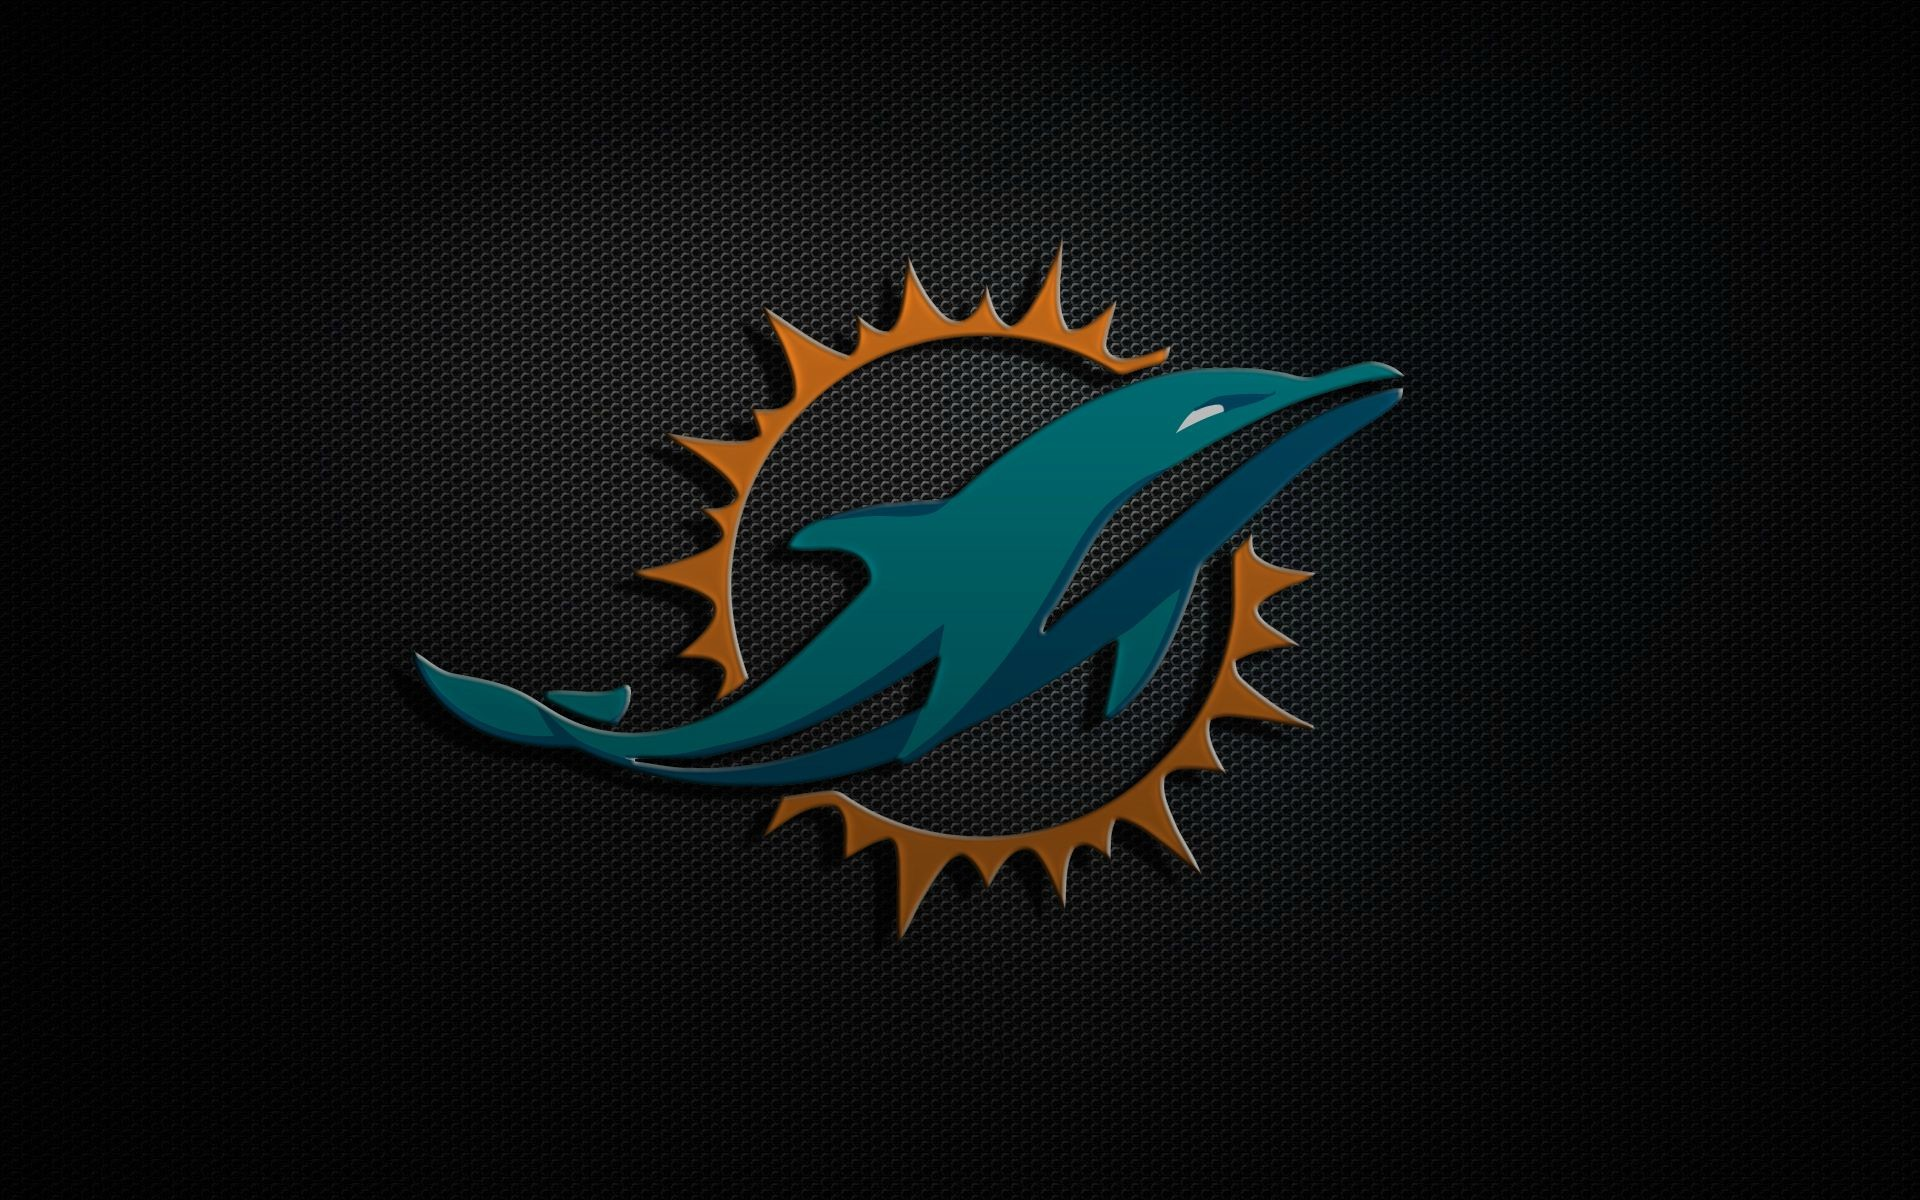 Free Miami Dolphins Wallpaper Screensavers